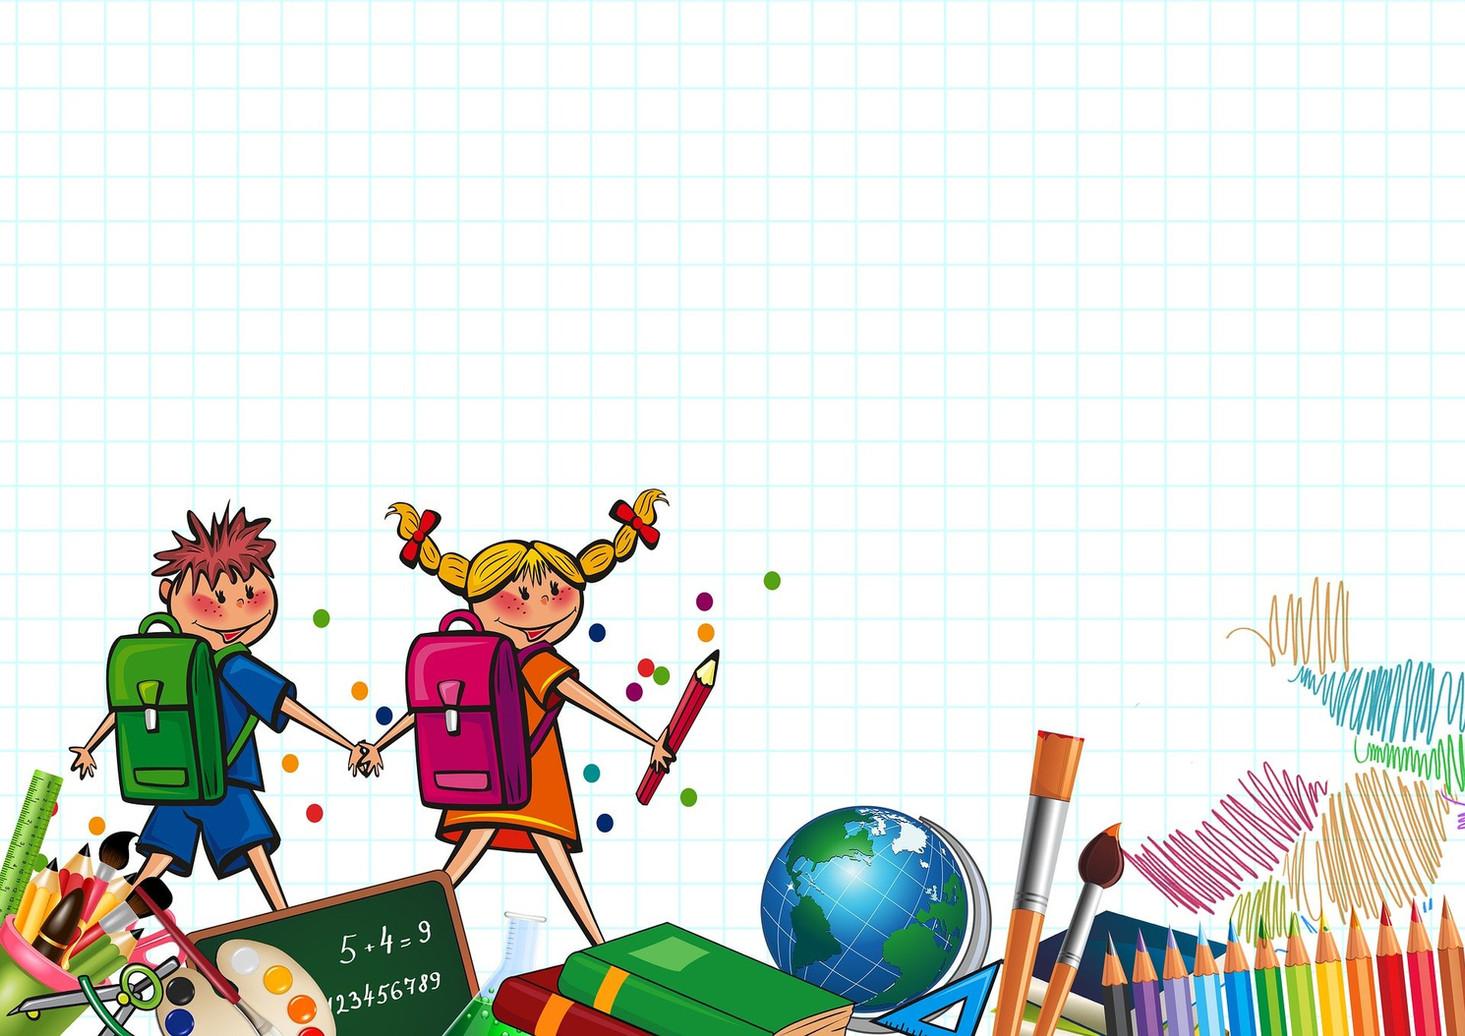 school-3518726_1920.jpg